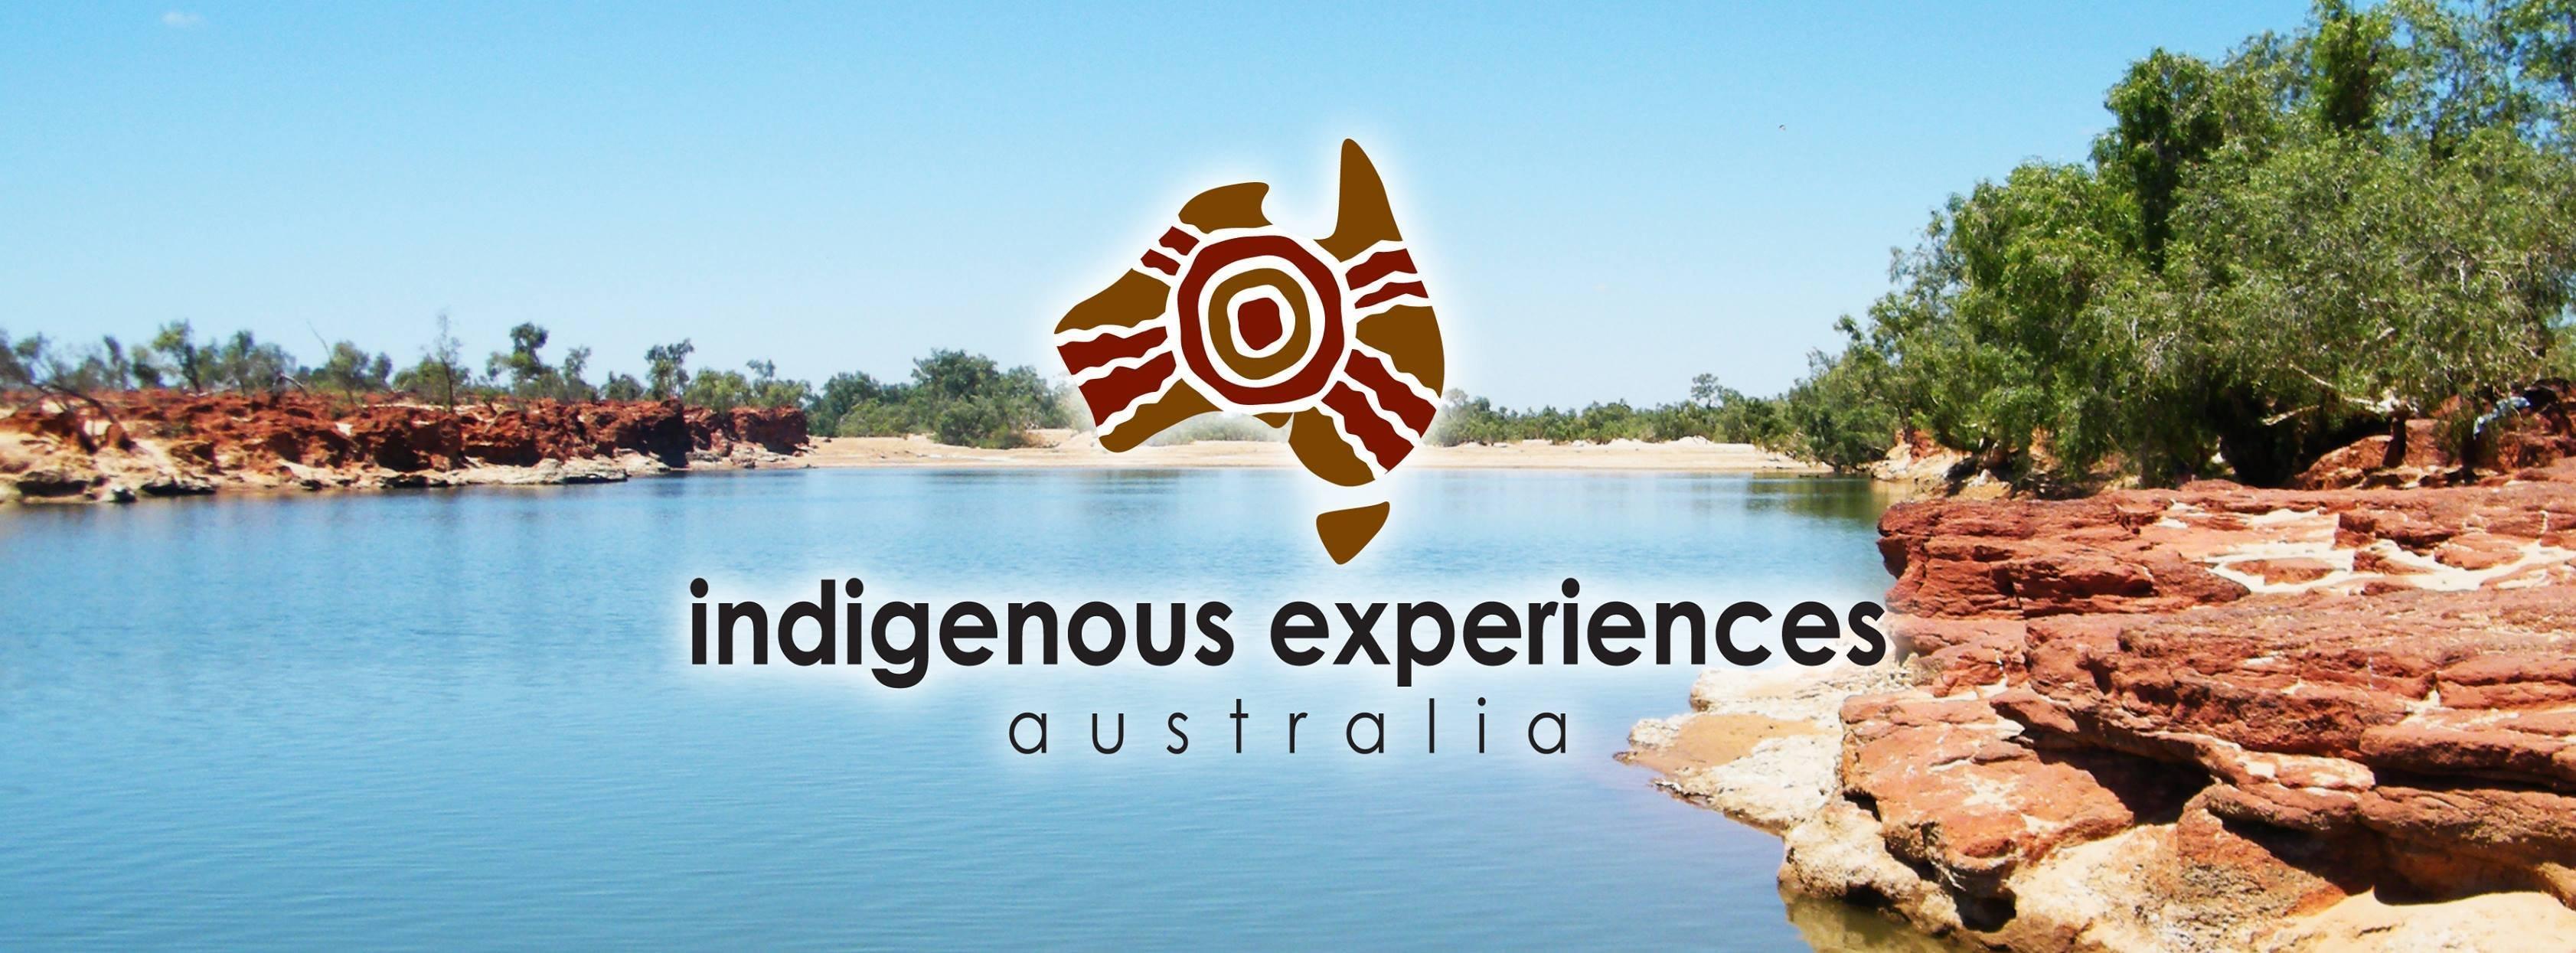 Indigenous Experiences Australia